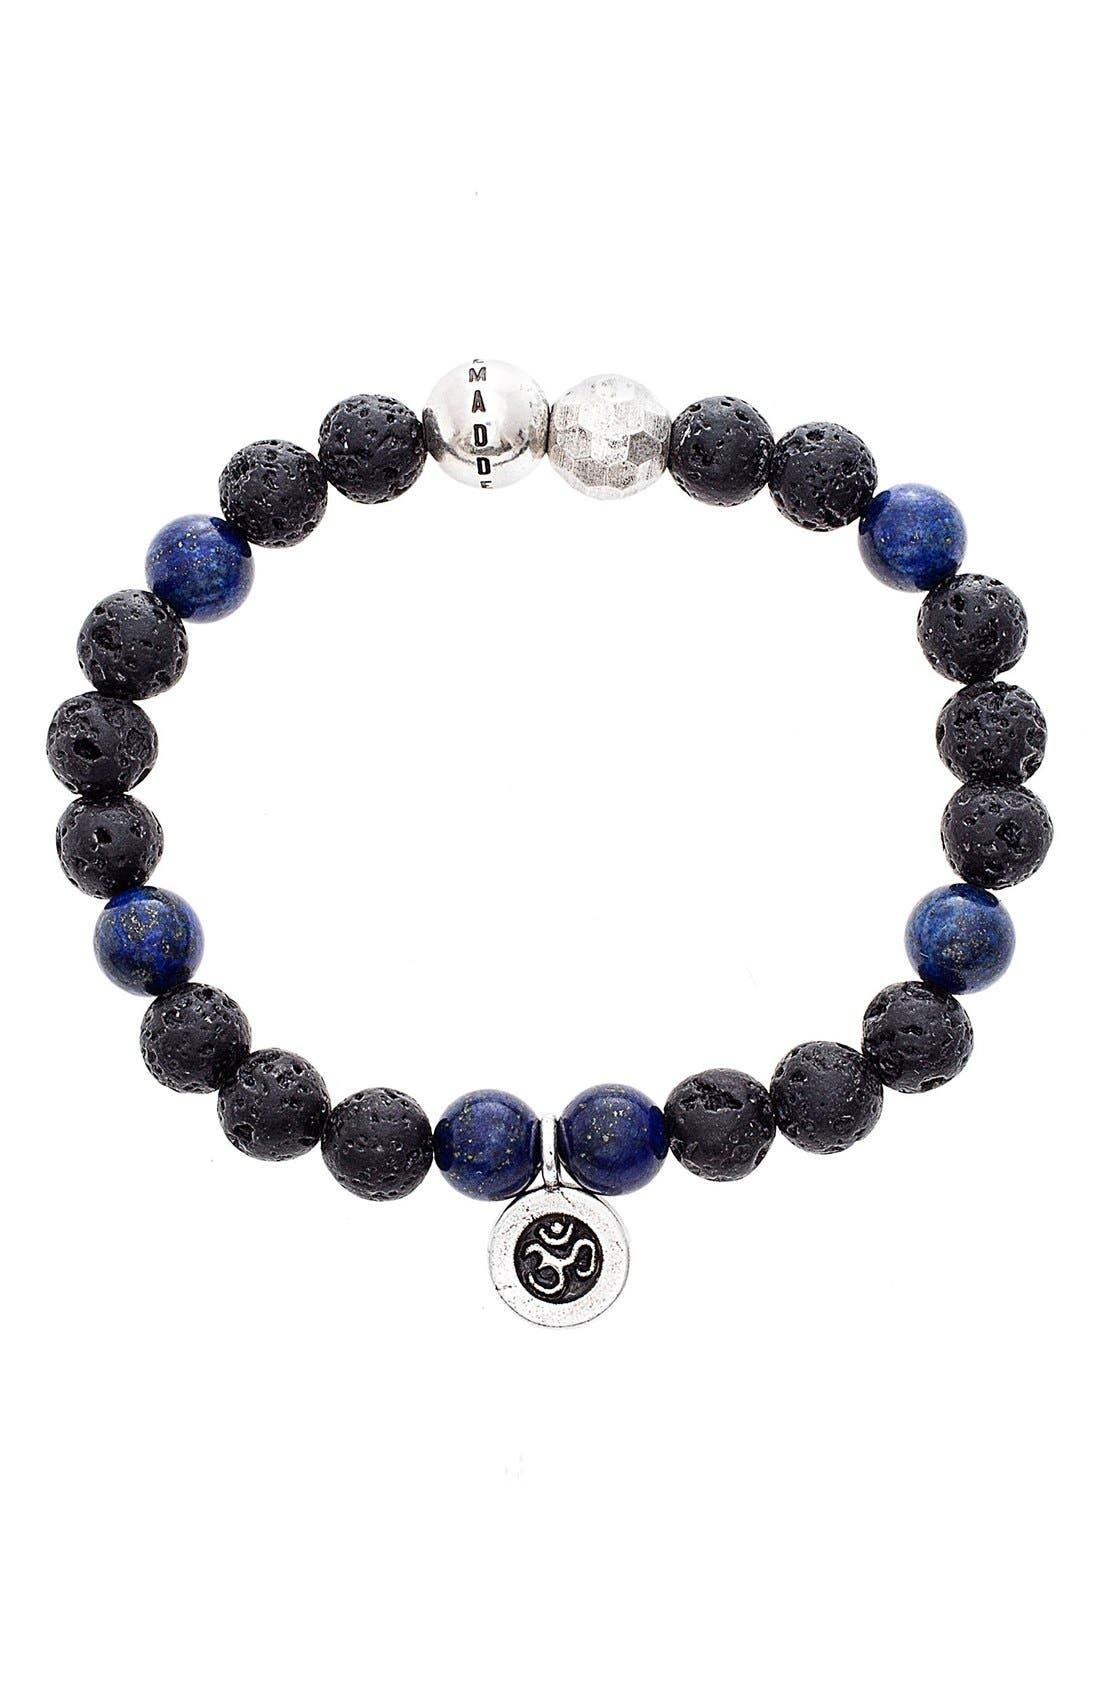 STEVE MADDEN Lapis Lazuli & Lava Rock Bead Bracelet